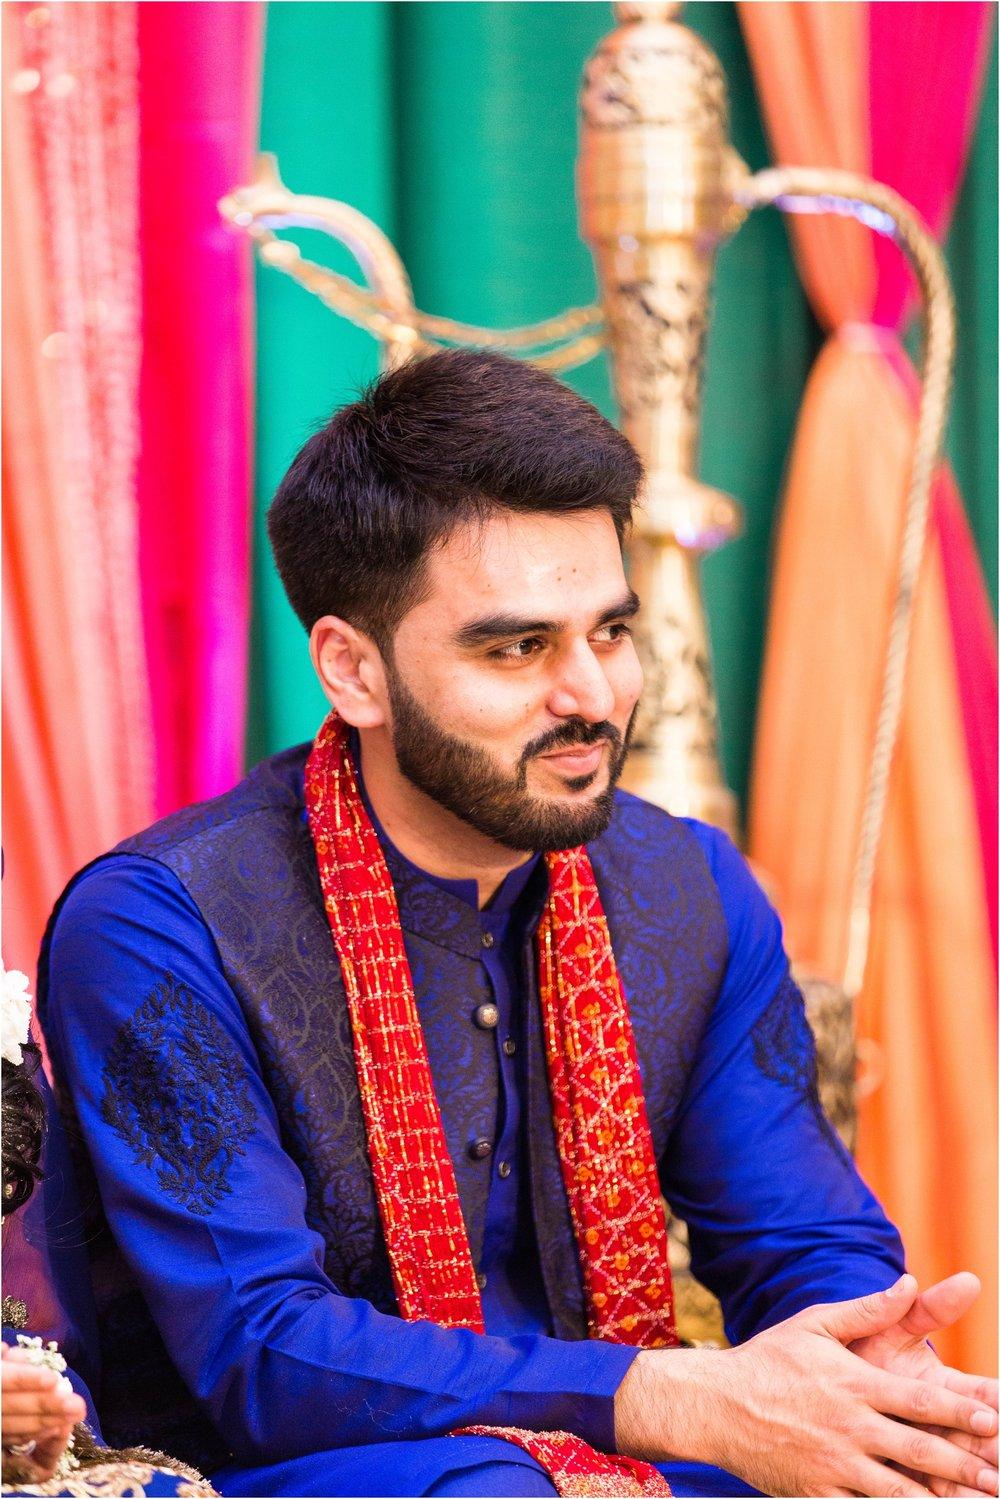 Mehndi-Markham-Convention-Centre-Toronto-Mississauga-Brampton-Scarborough-GTA-Pakistani-Indian-Wedding-Engagement-Photographer-Photography_0008.jpg